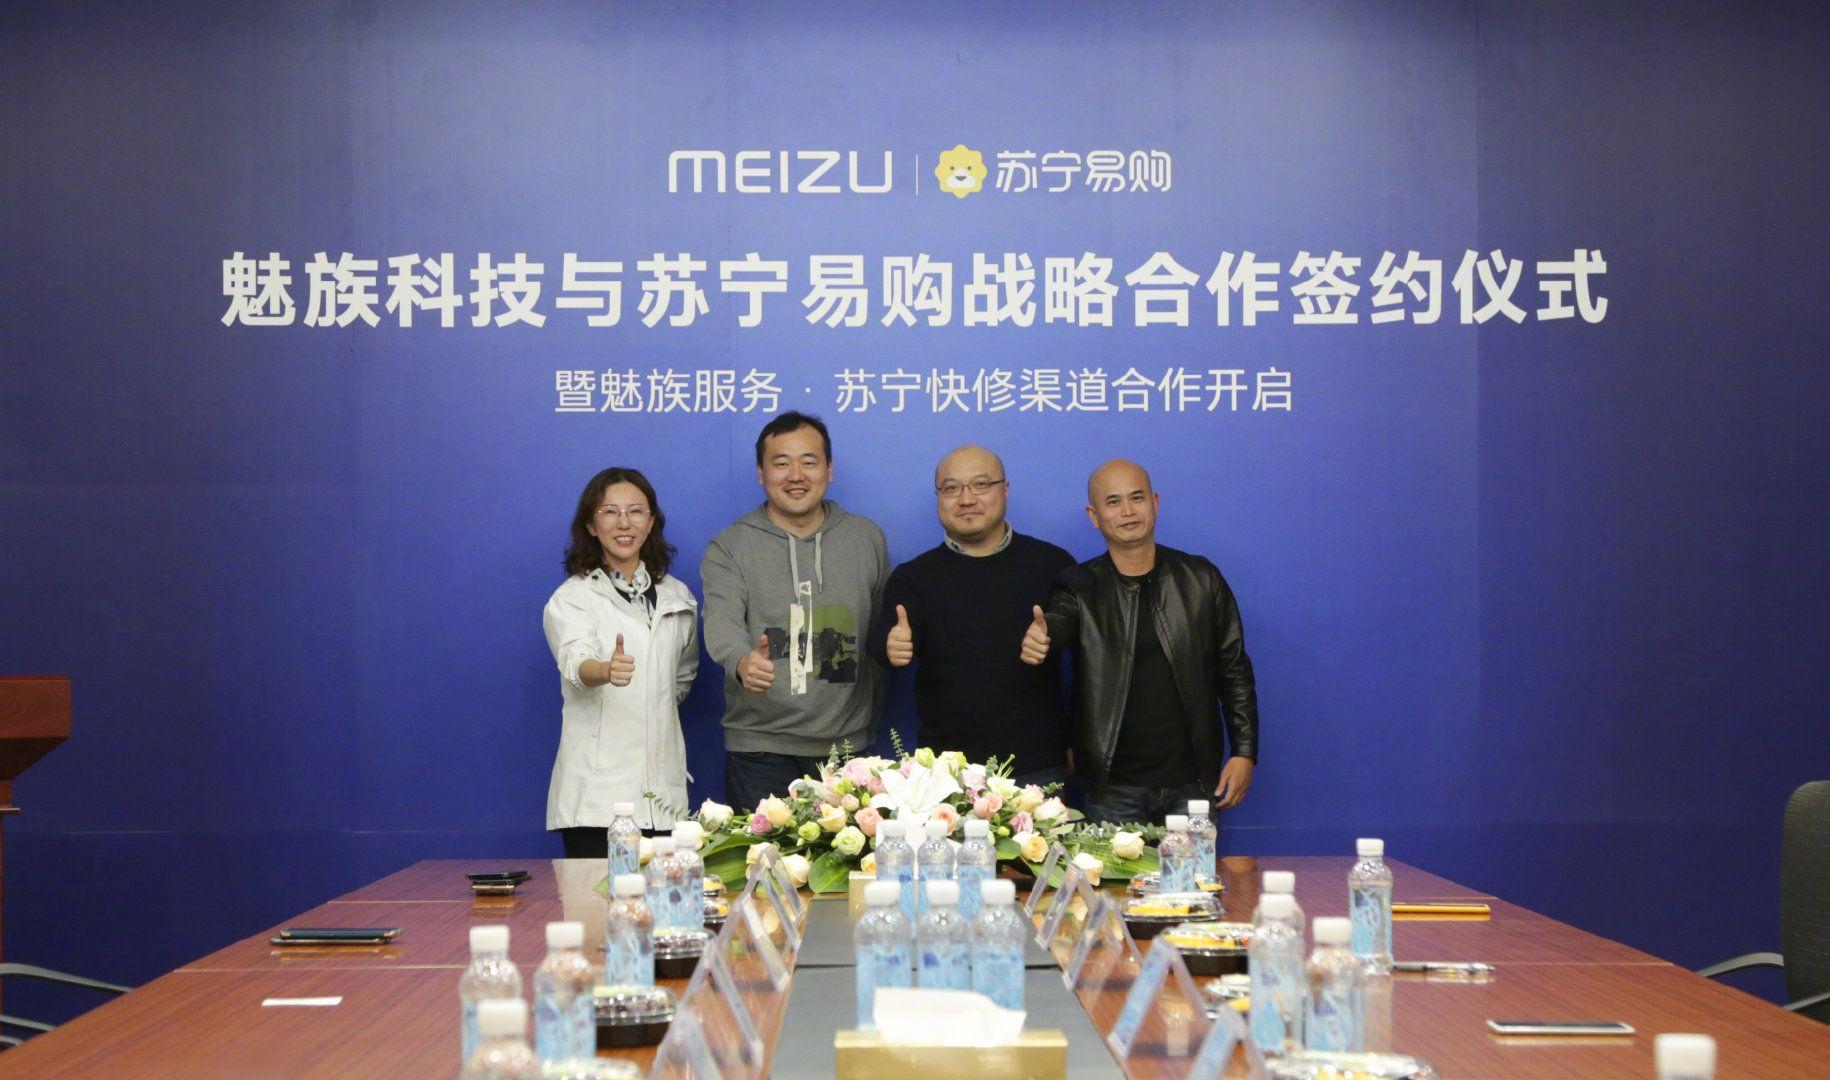 MEIZUが蘇寧易購(Suning.com)と戦略的協力協定を正式に締結